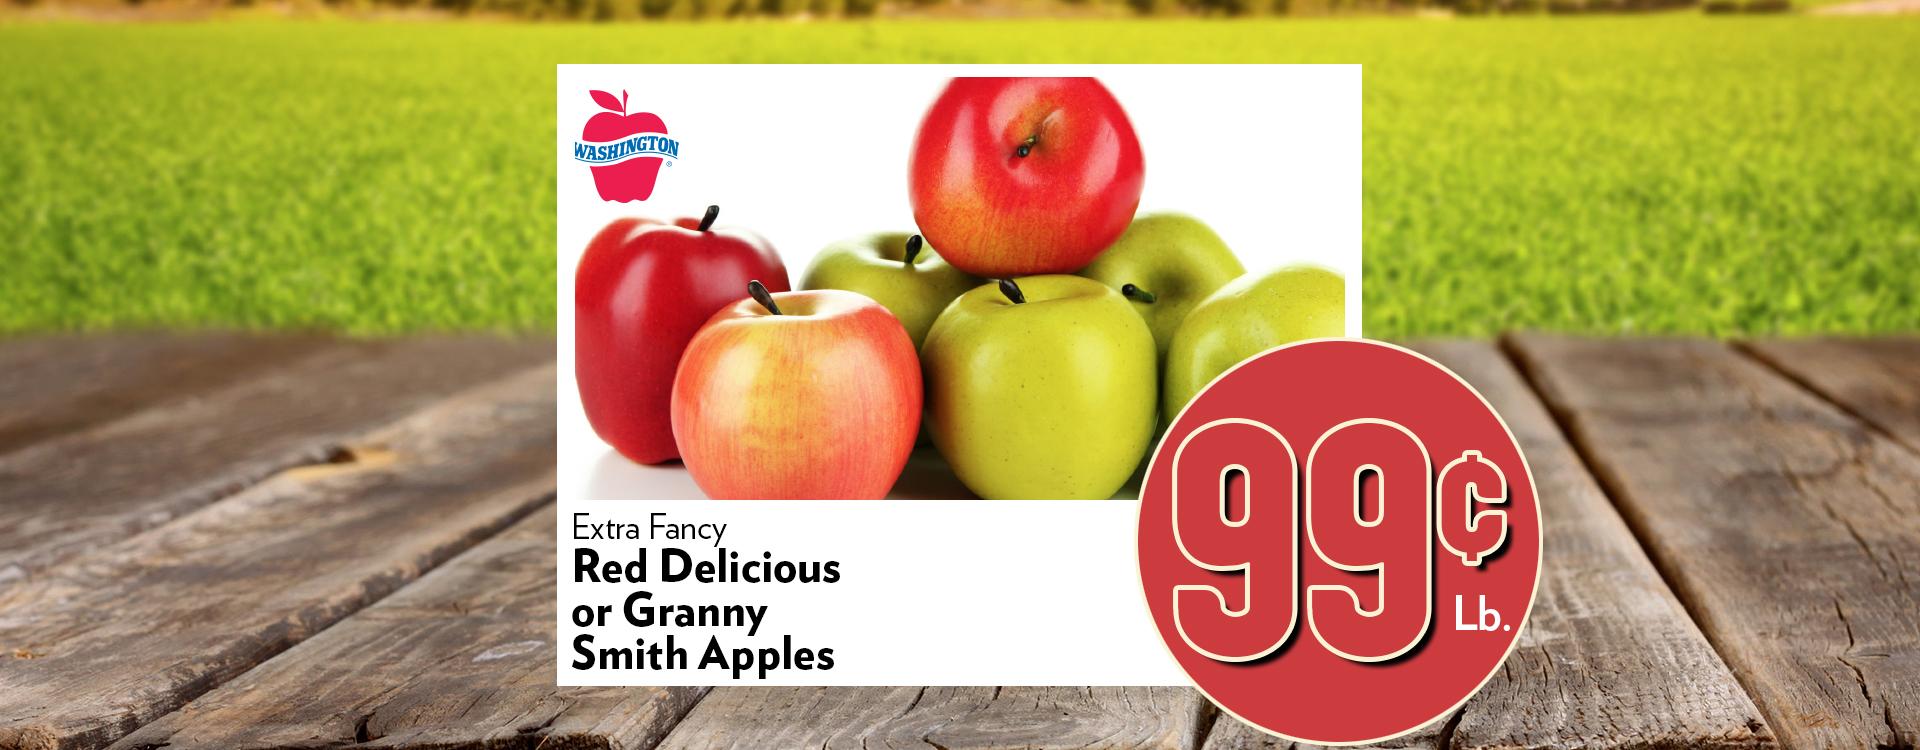 Cannata's_apples